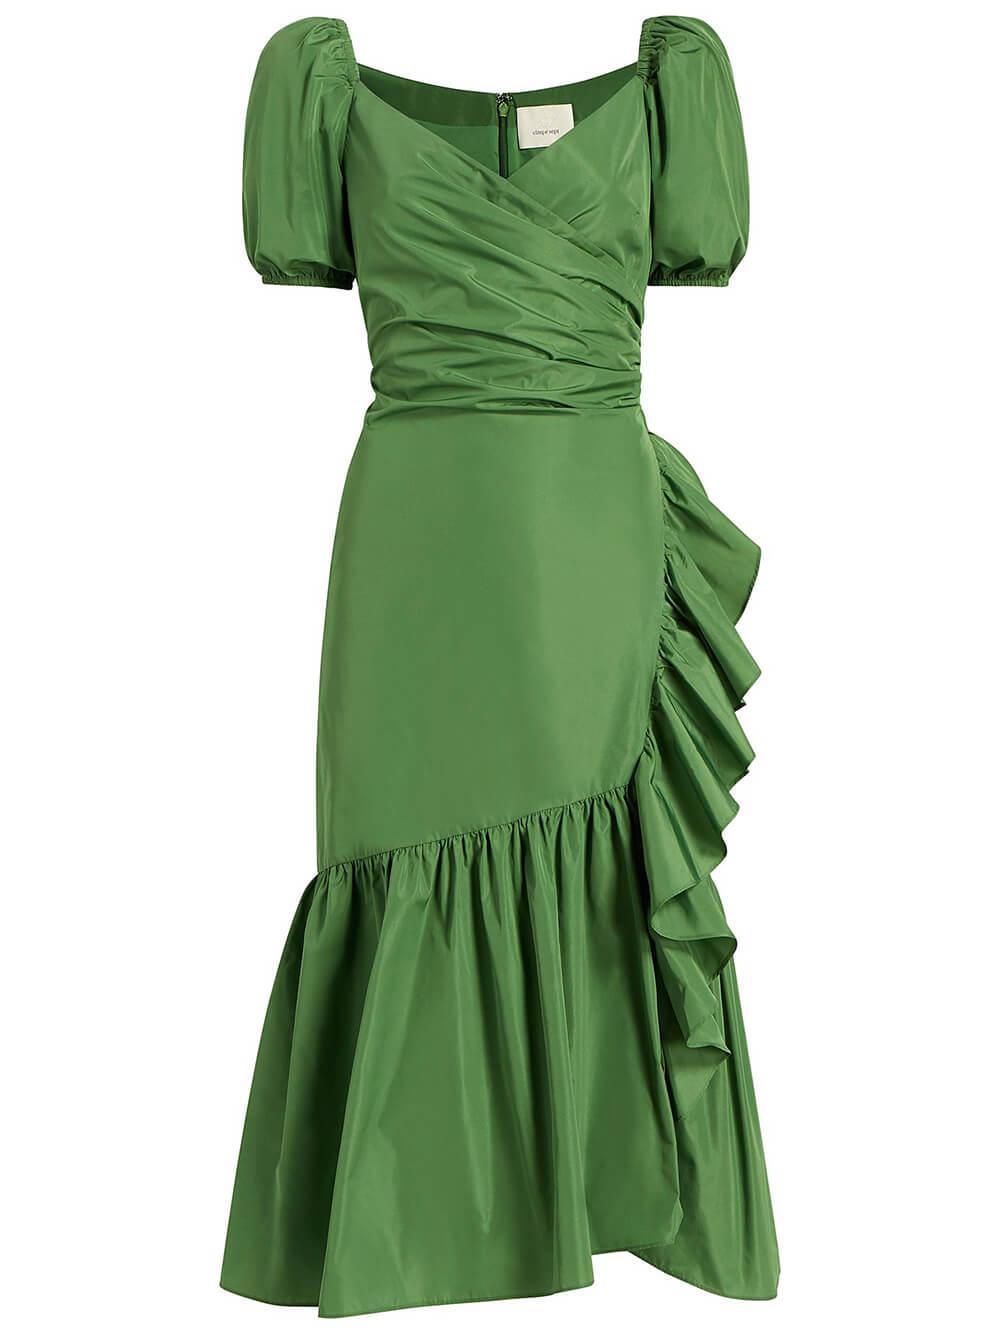 Megan Dress Item # ZD13213912Z